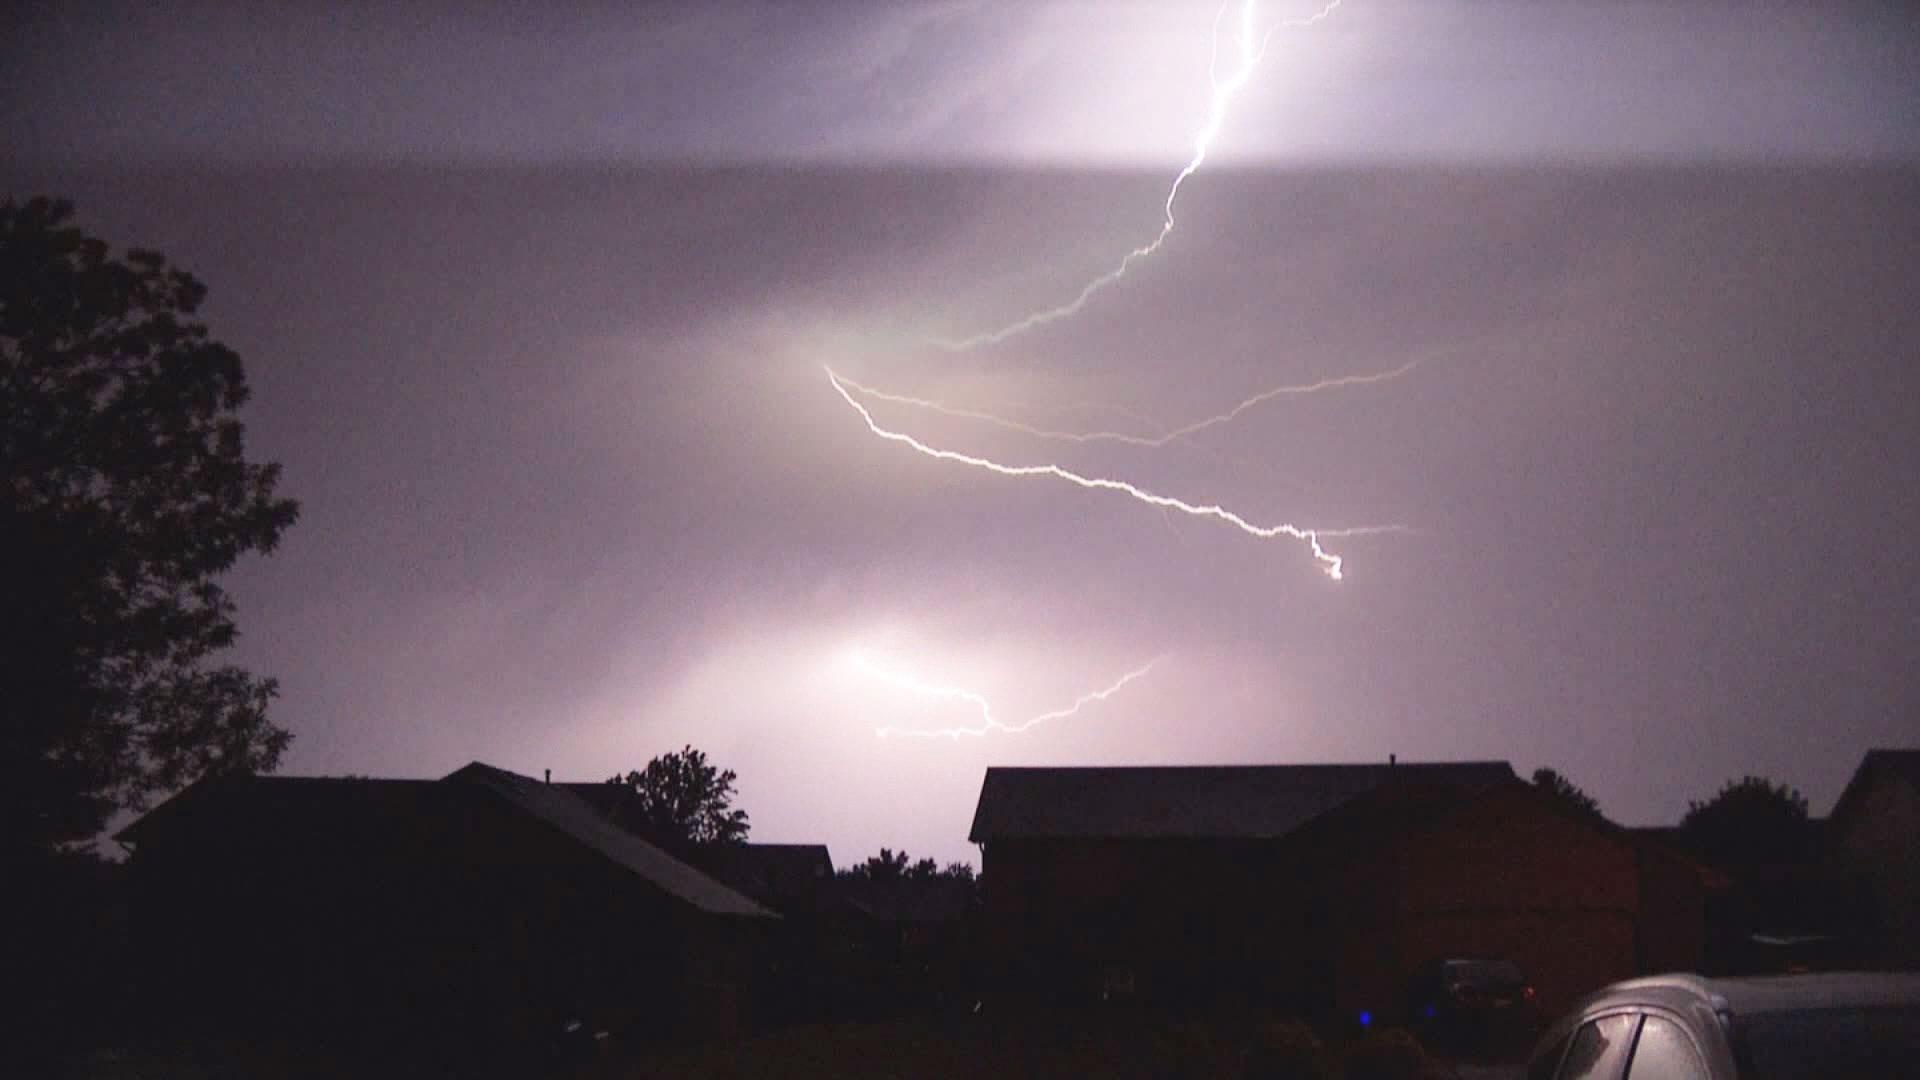 KELO Lightning Severe Weather